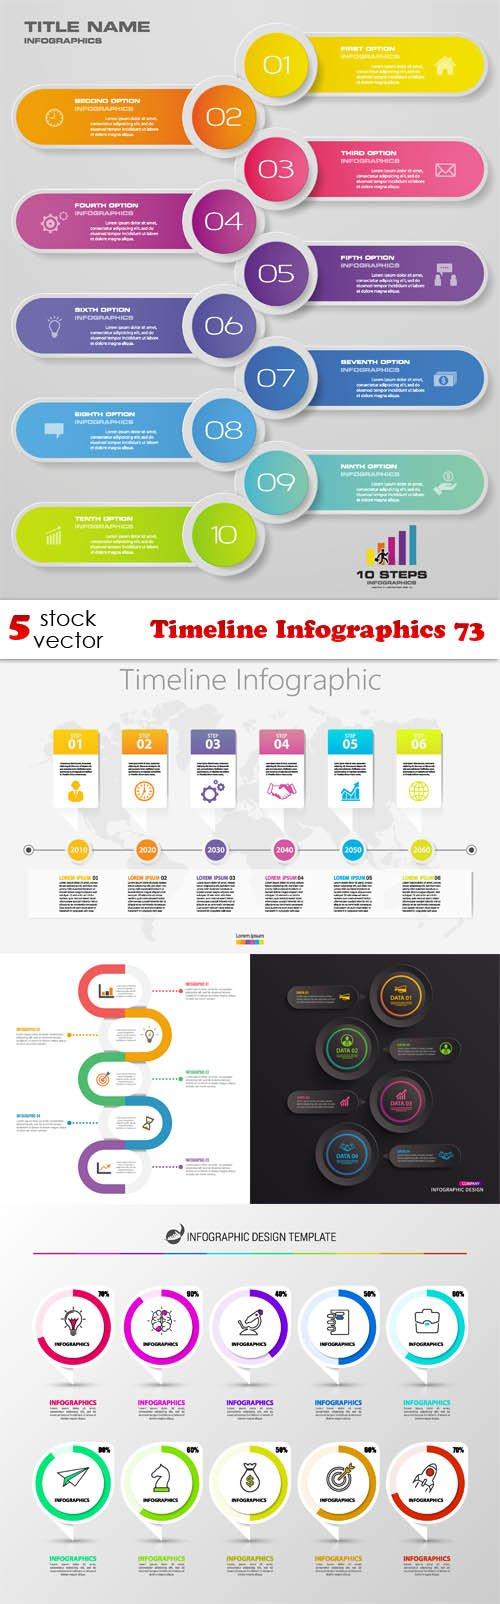 Vectors - Timeline Infographics 73